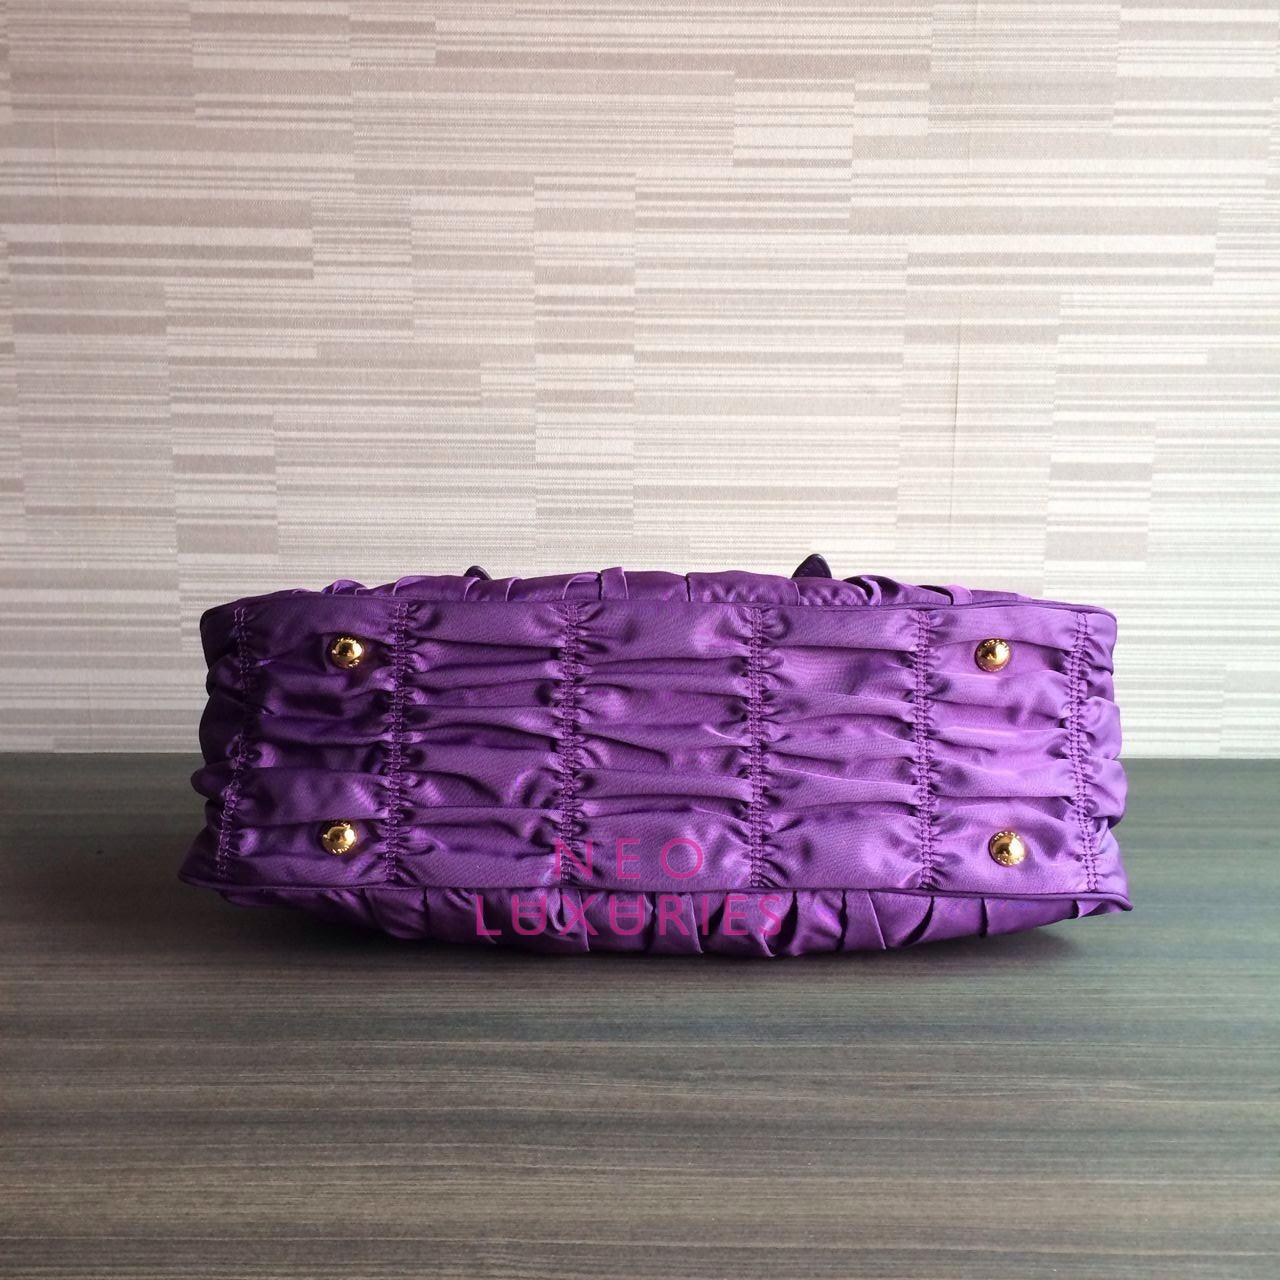 prada leather bag men - Neo LUXuries: SOLD: PRADA Tessuto/Nappa Gaufre' Small Top Handle ...